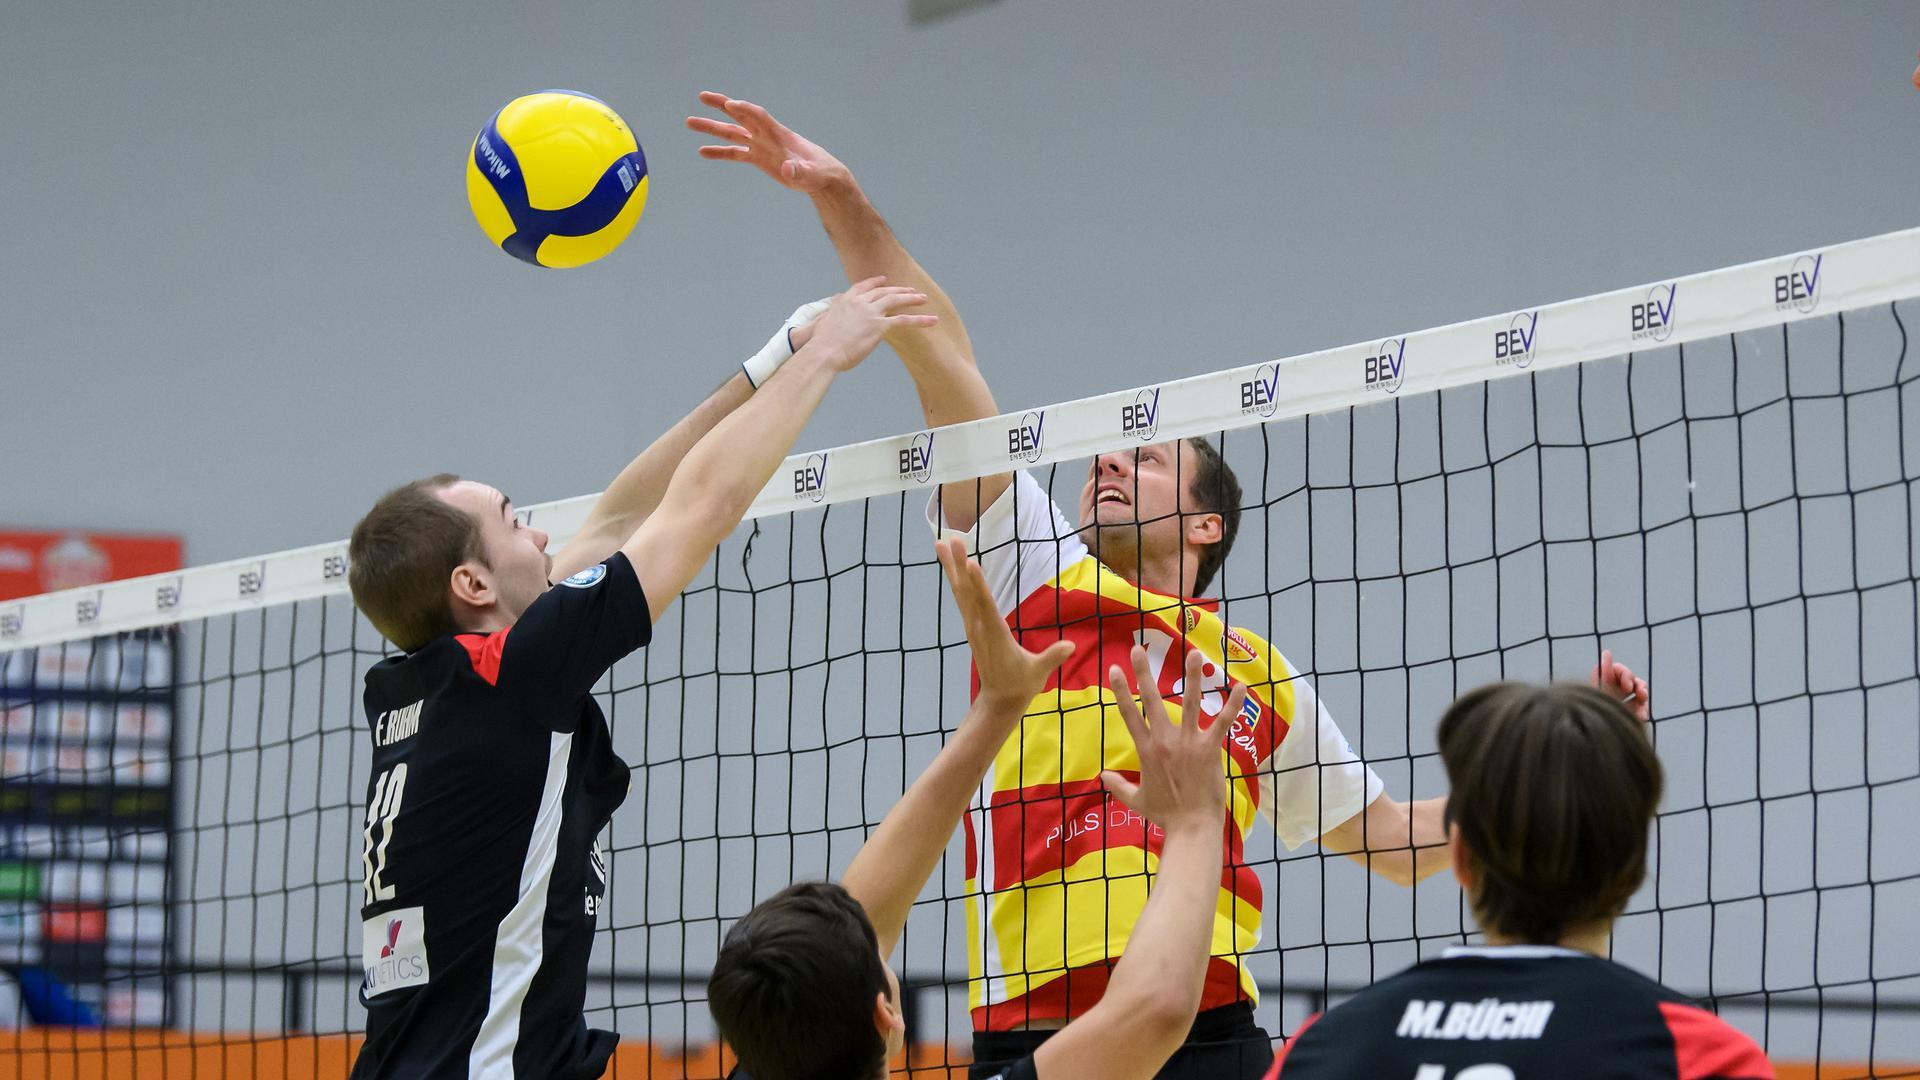 Sebastian Sent (SSC) im Zweikampf mit Florian Ruhm (TuS).  GES/ Volleyball/ 2. Bundesliga-Sued:  Baden Volleys - TuS Kriftel, 21.11.2020 --